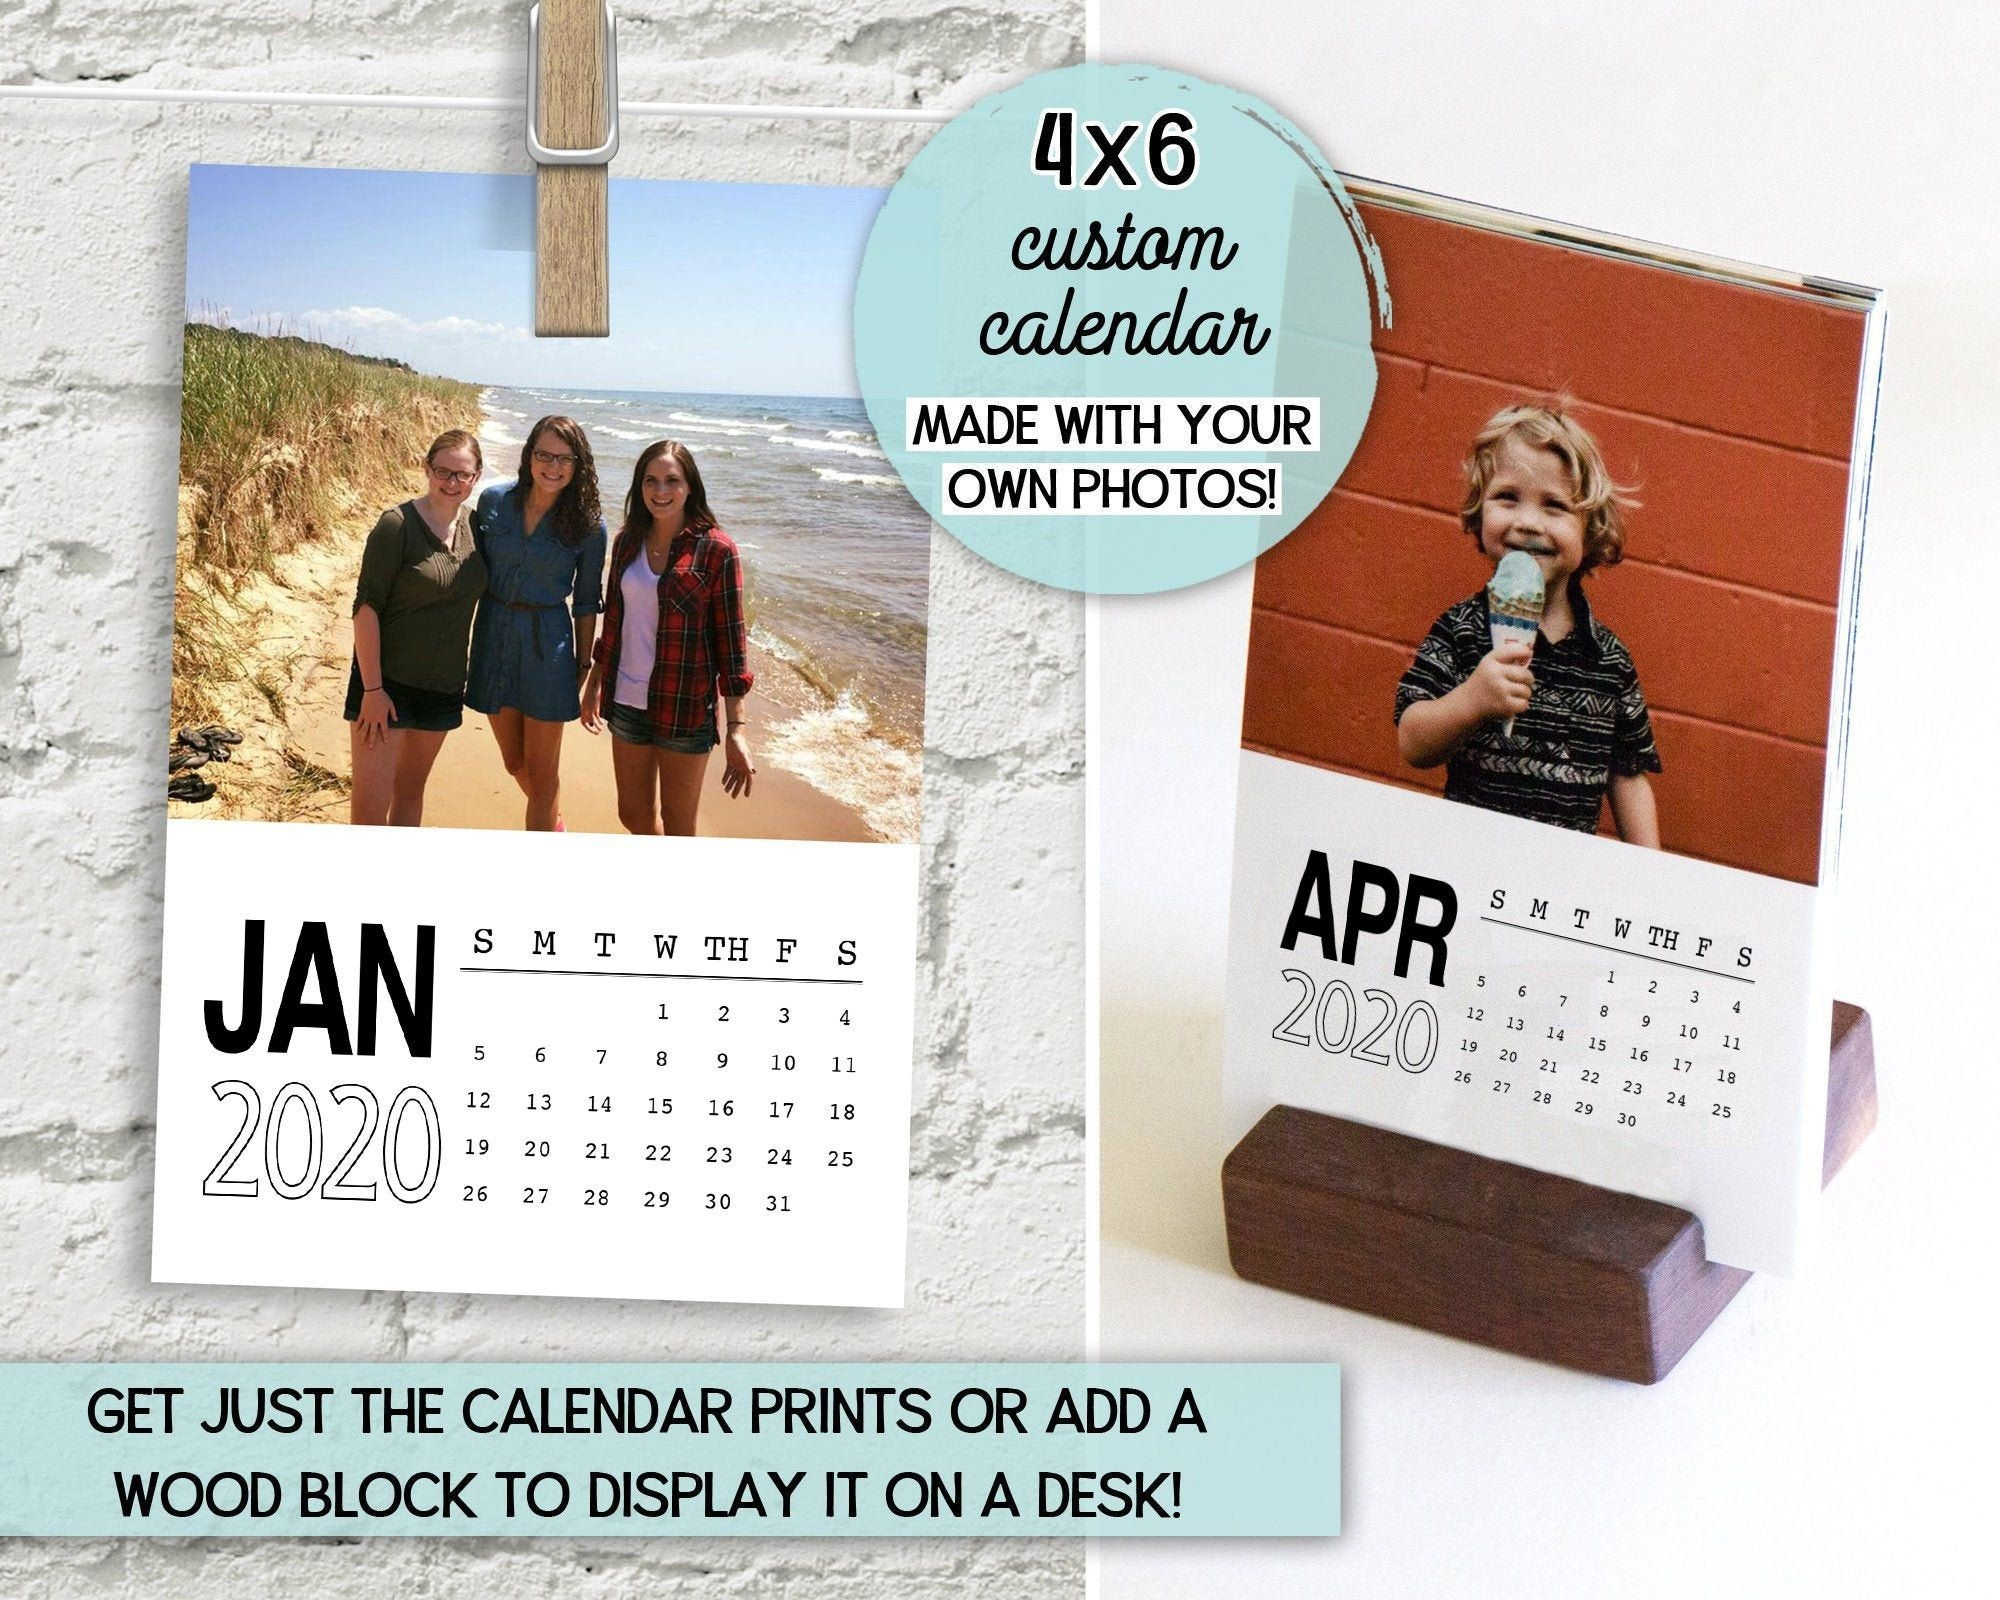 4x6 desk calendar, custom calendar 2020, personalized calendar, gifts for dad, custom photo calendar, wood block calendar with wood stand